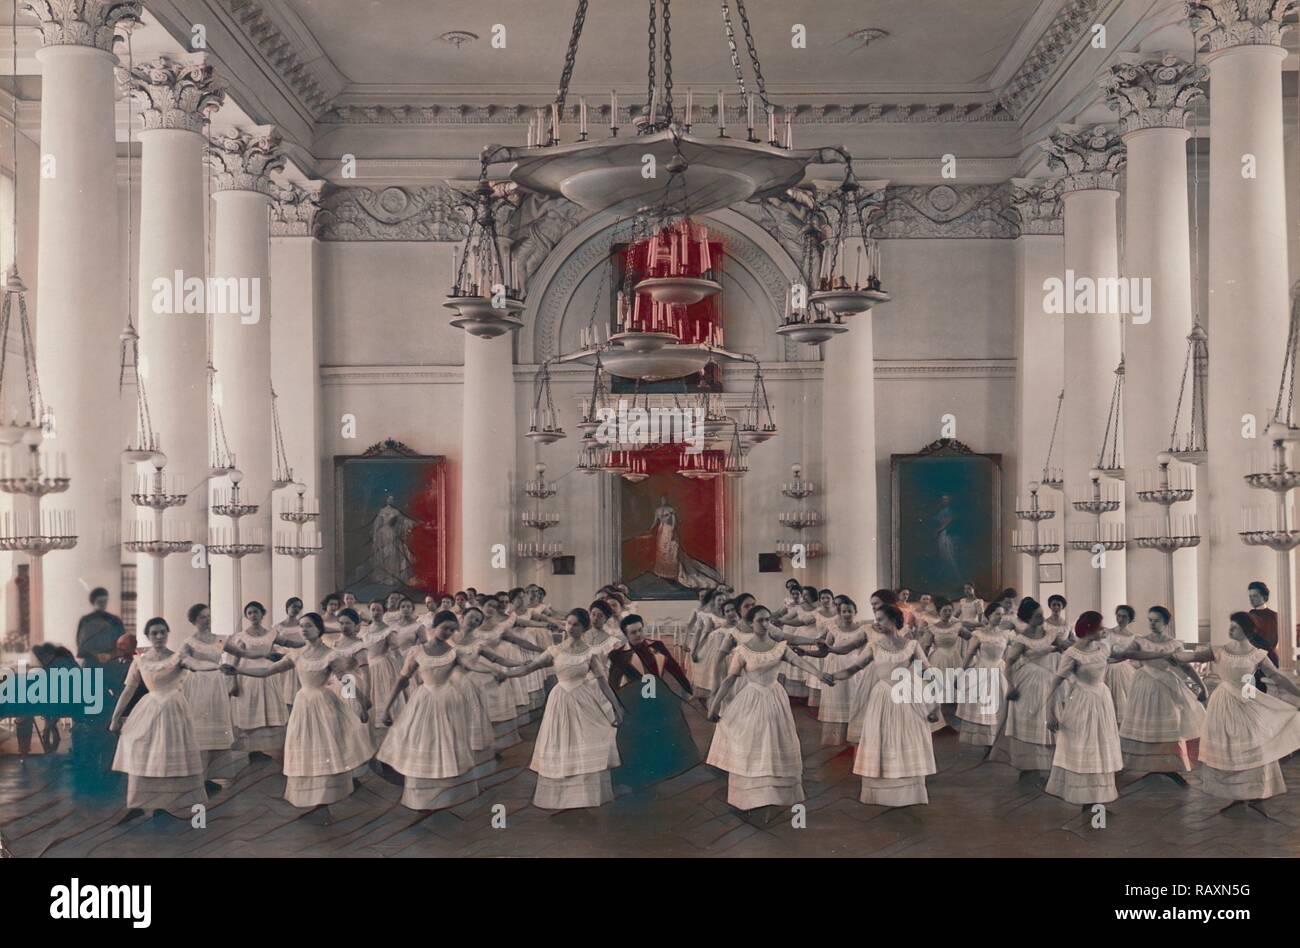 Dancing Lesson, the 'Mazurka'., Karl Karlovitz Bulla, Russian, 1854 - 1929, before 1917, Gelatin silver print, Image reimagined - Stock Image